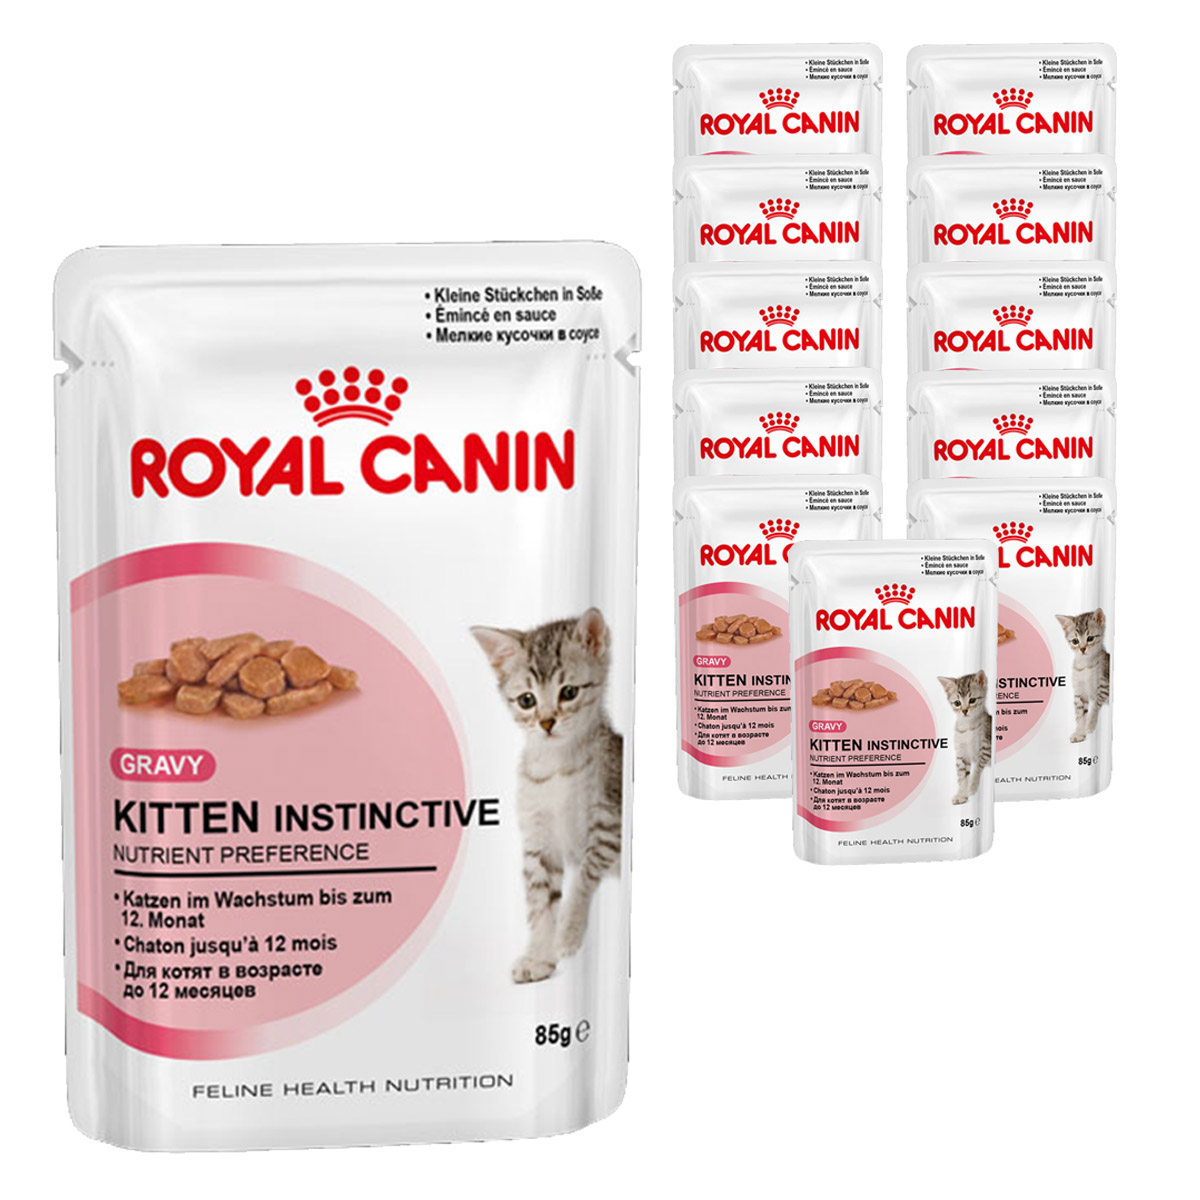 royal canin katzenfutter gravy kitten instinctive in so e 12x85g. Black Bedroom Furniture Sets. Home Design Ideas